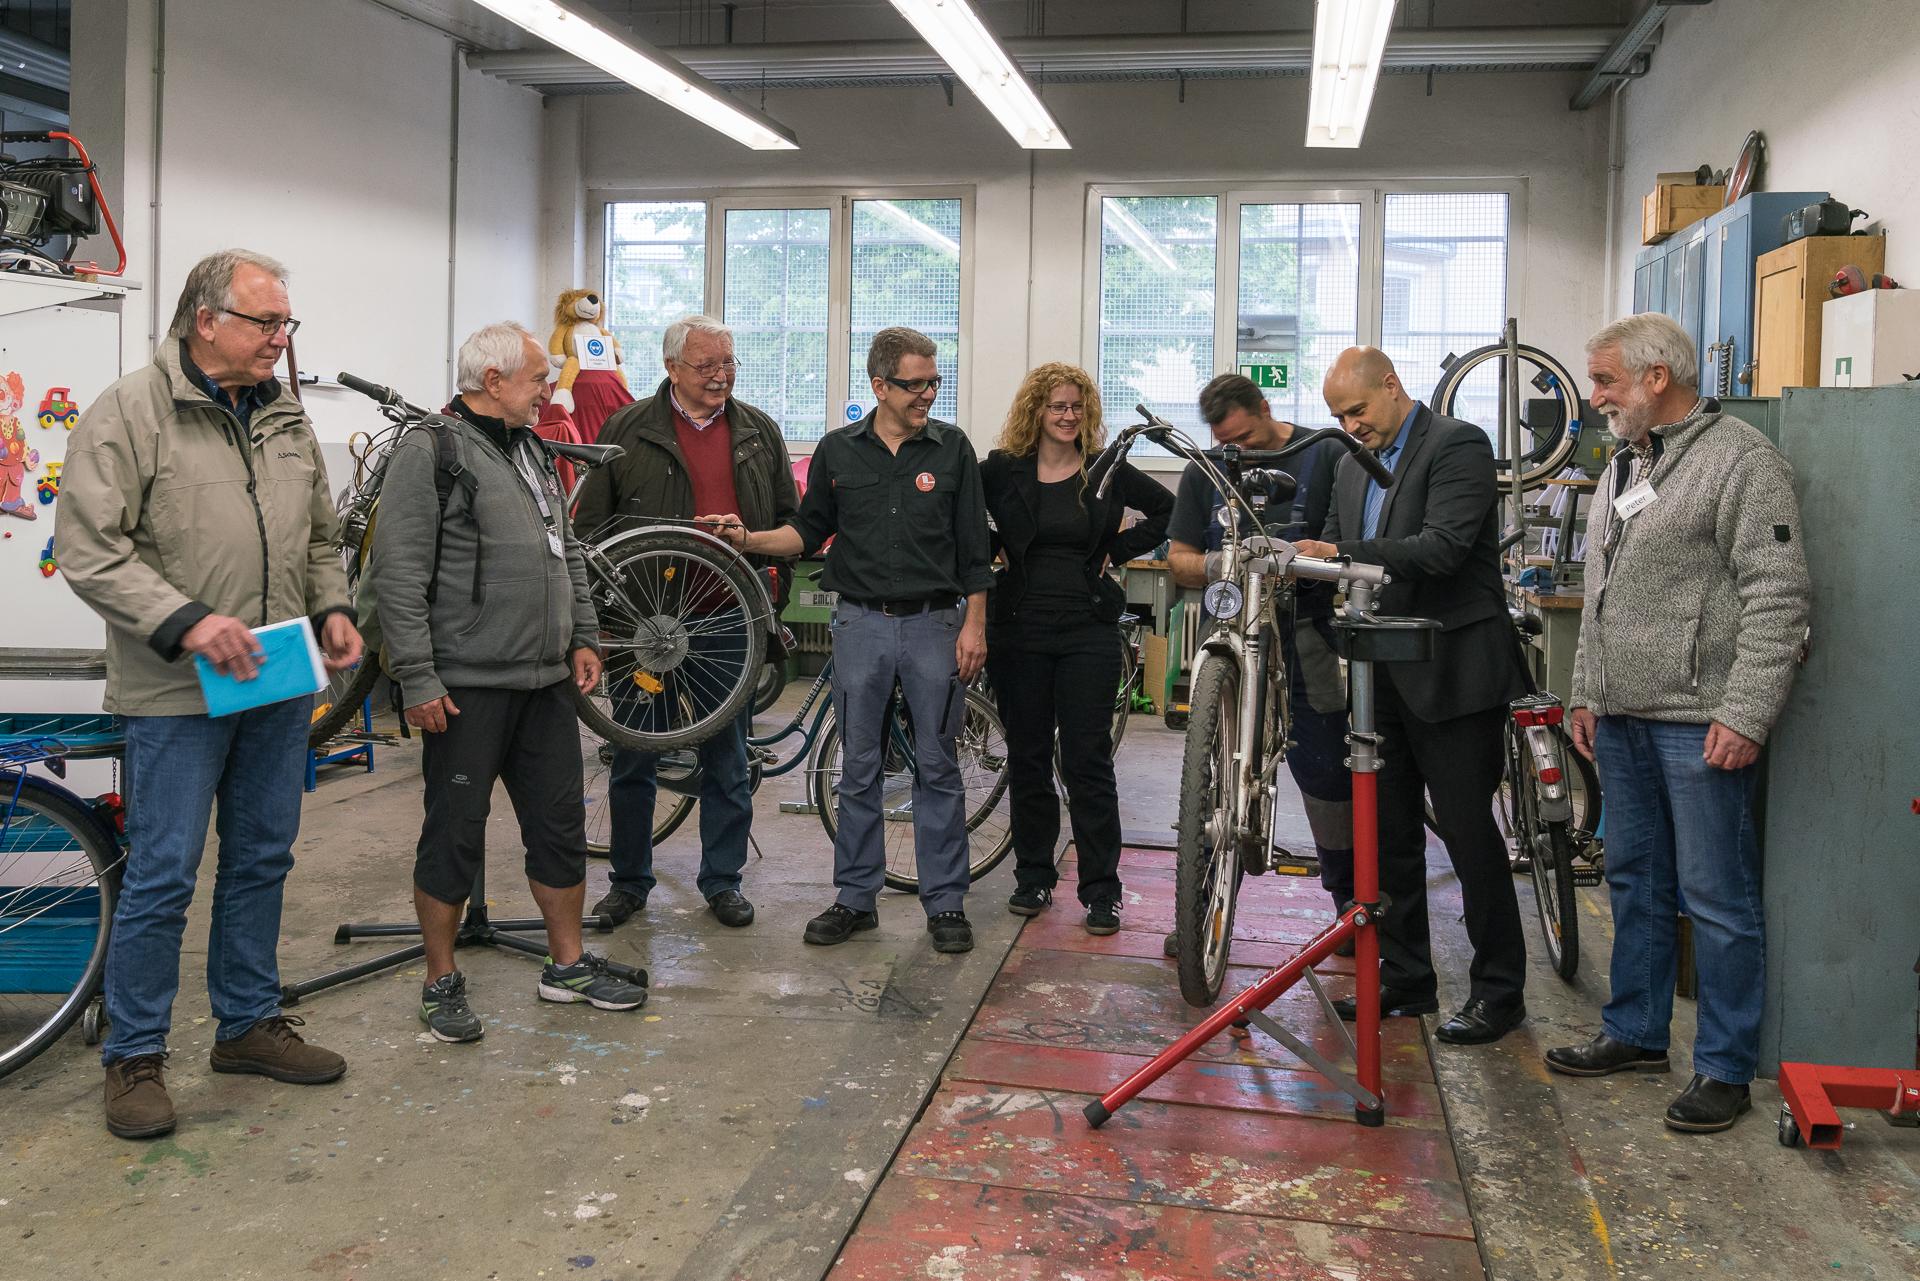 Eröffnung Fahrradwerkstatt AK Asyl im Specht